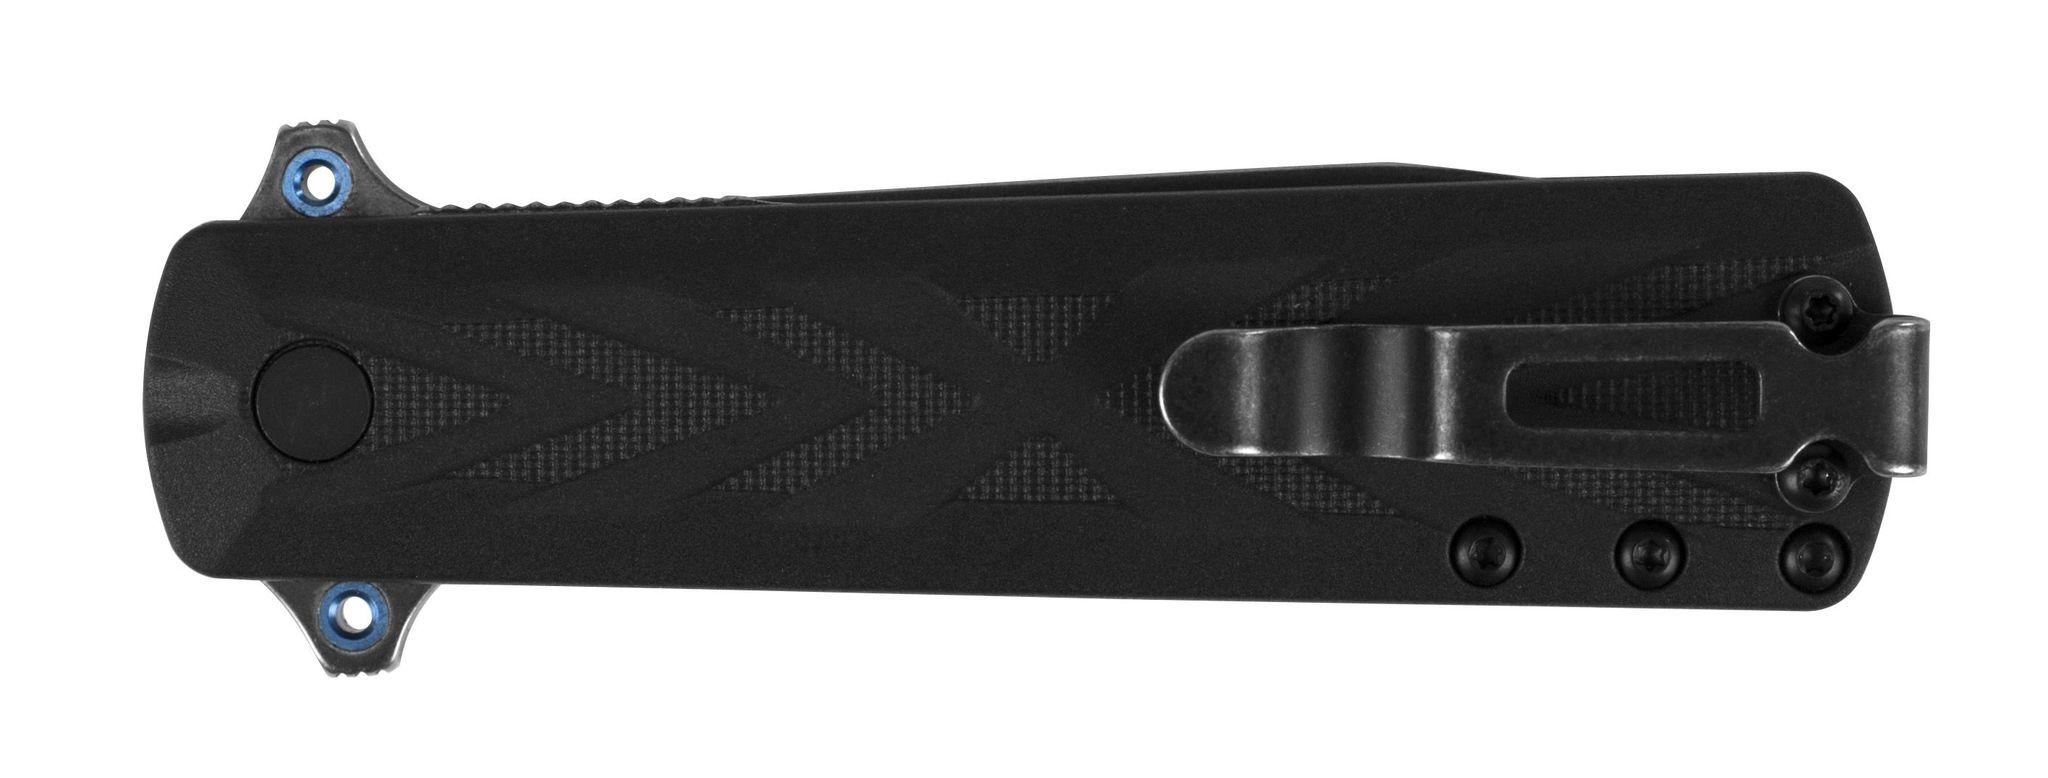 Фото 2 - Складной полуавтоматический нож Kershaw Barstow K3960, сталь 8Cr13MoV, рукоять пластик